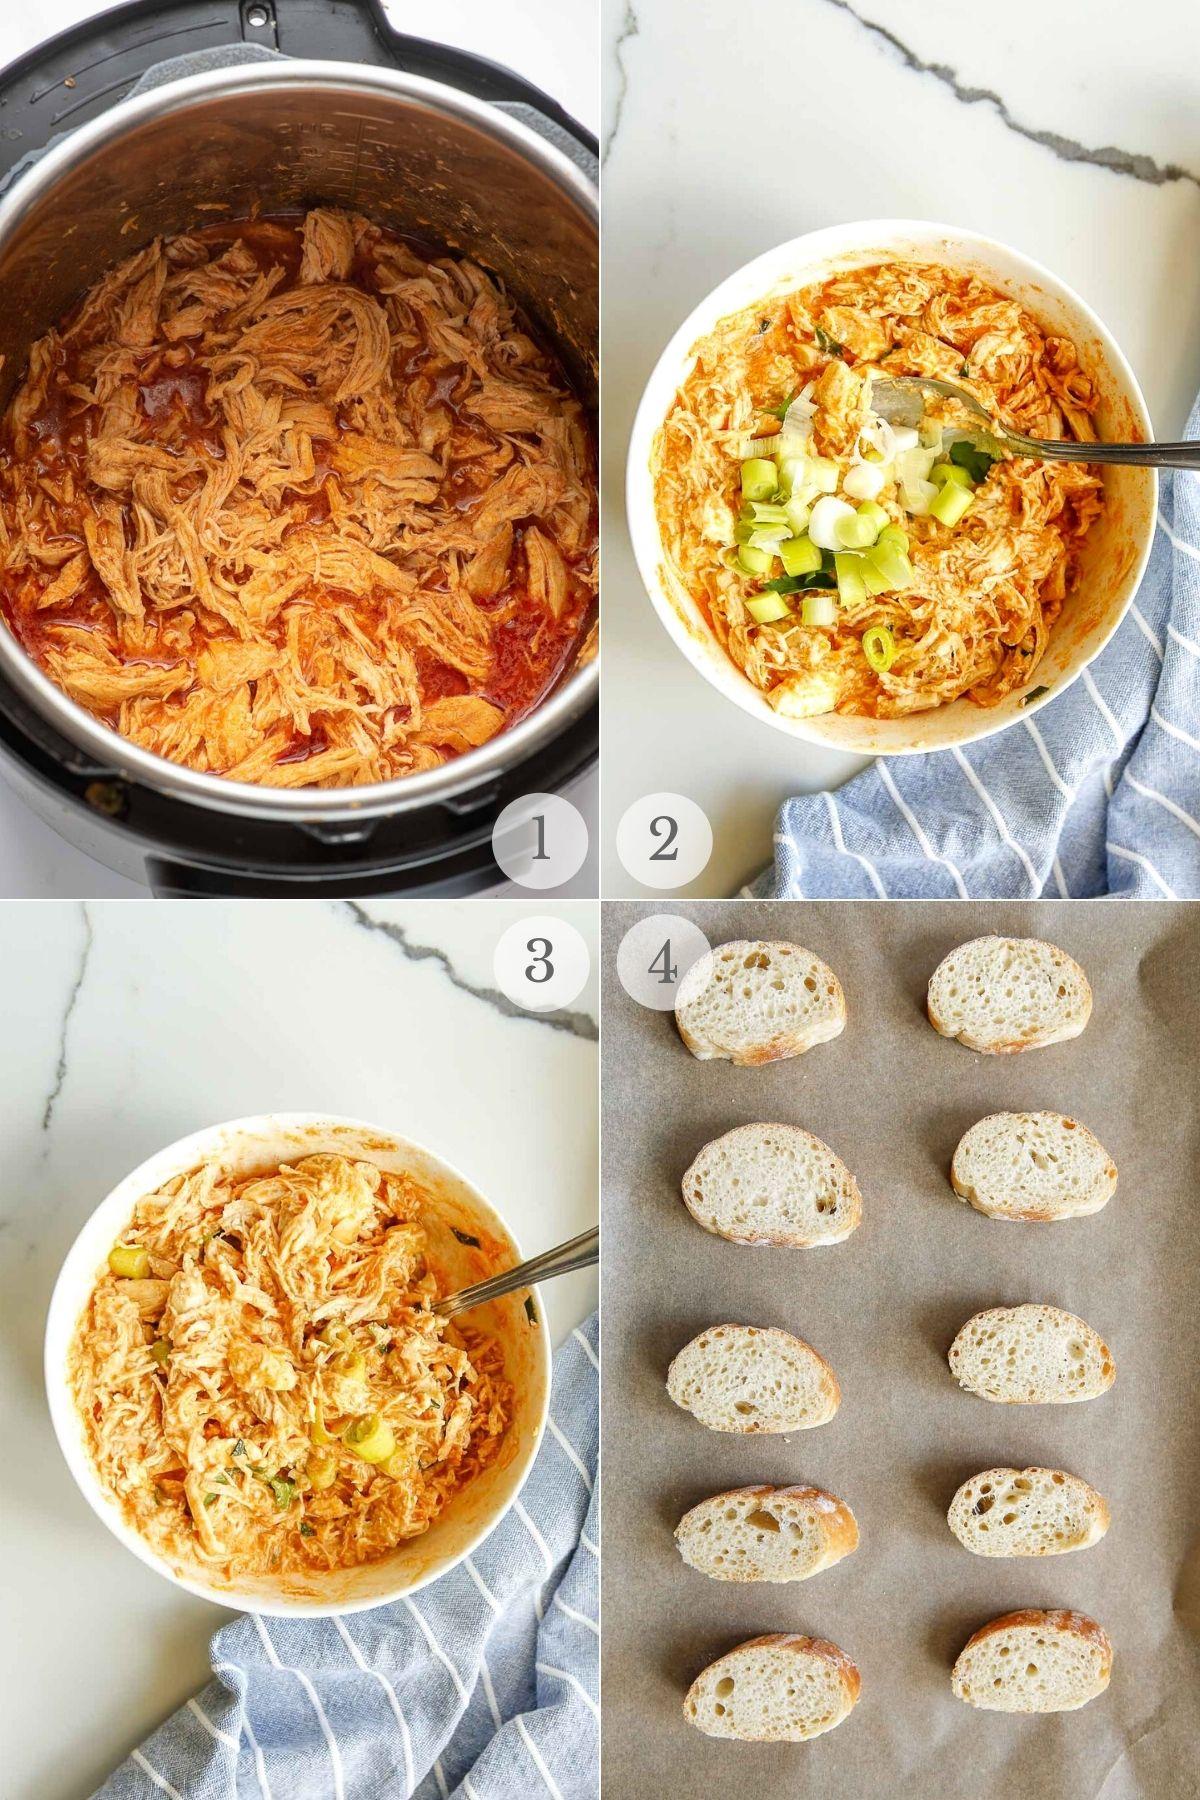 buffalo chicken crostini recipe steps 1-4